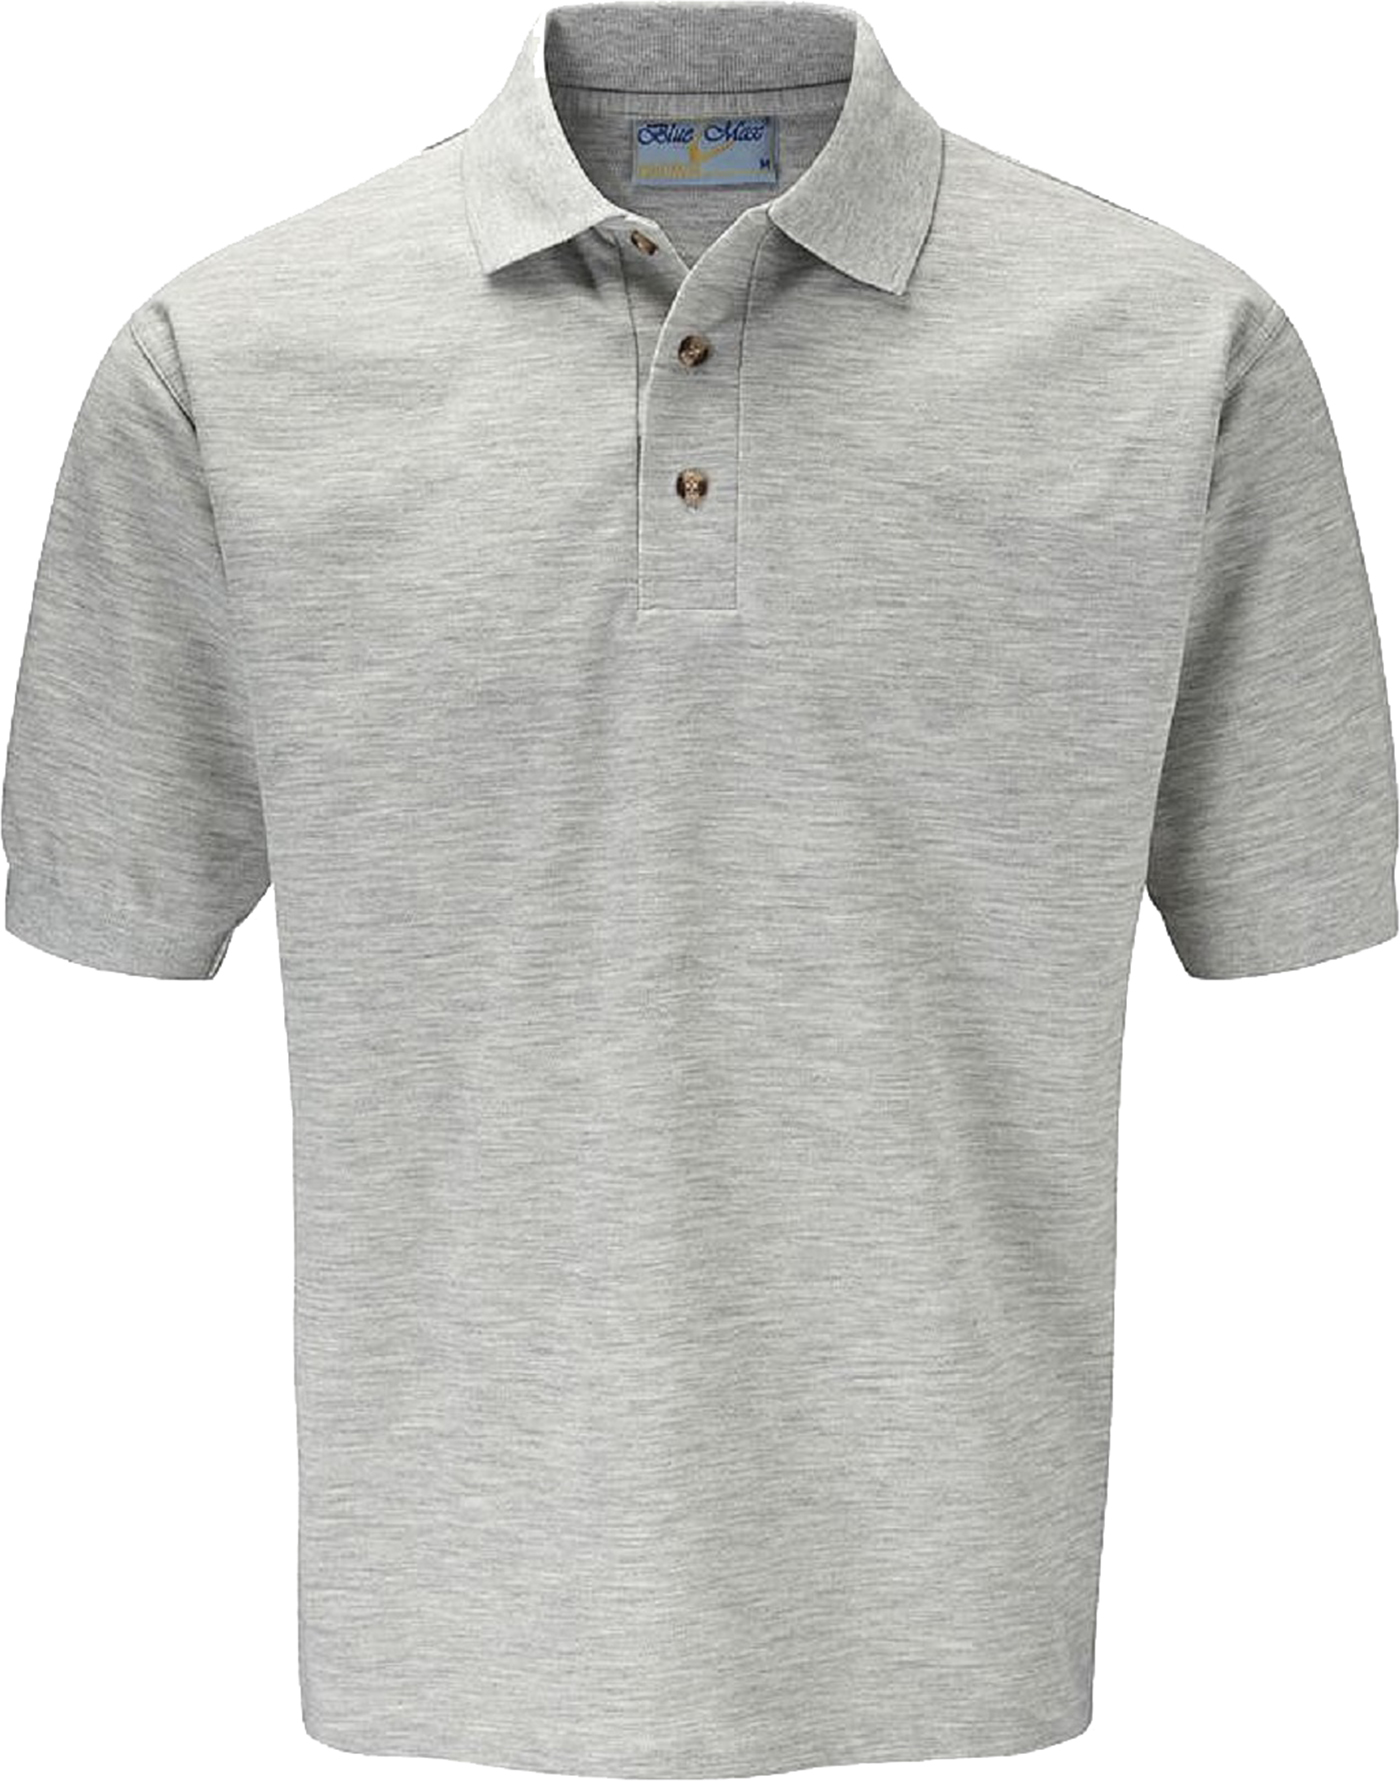 School uniform pe games polo shirt only uniform uk ebay for Polo shirts for school